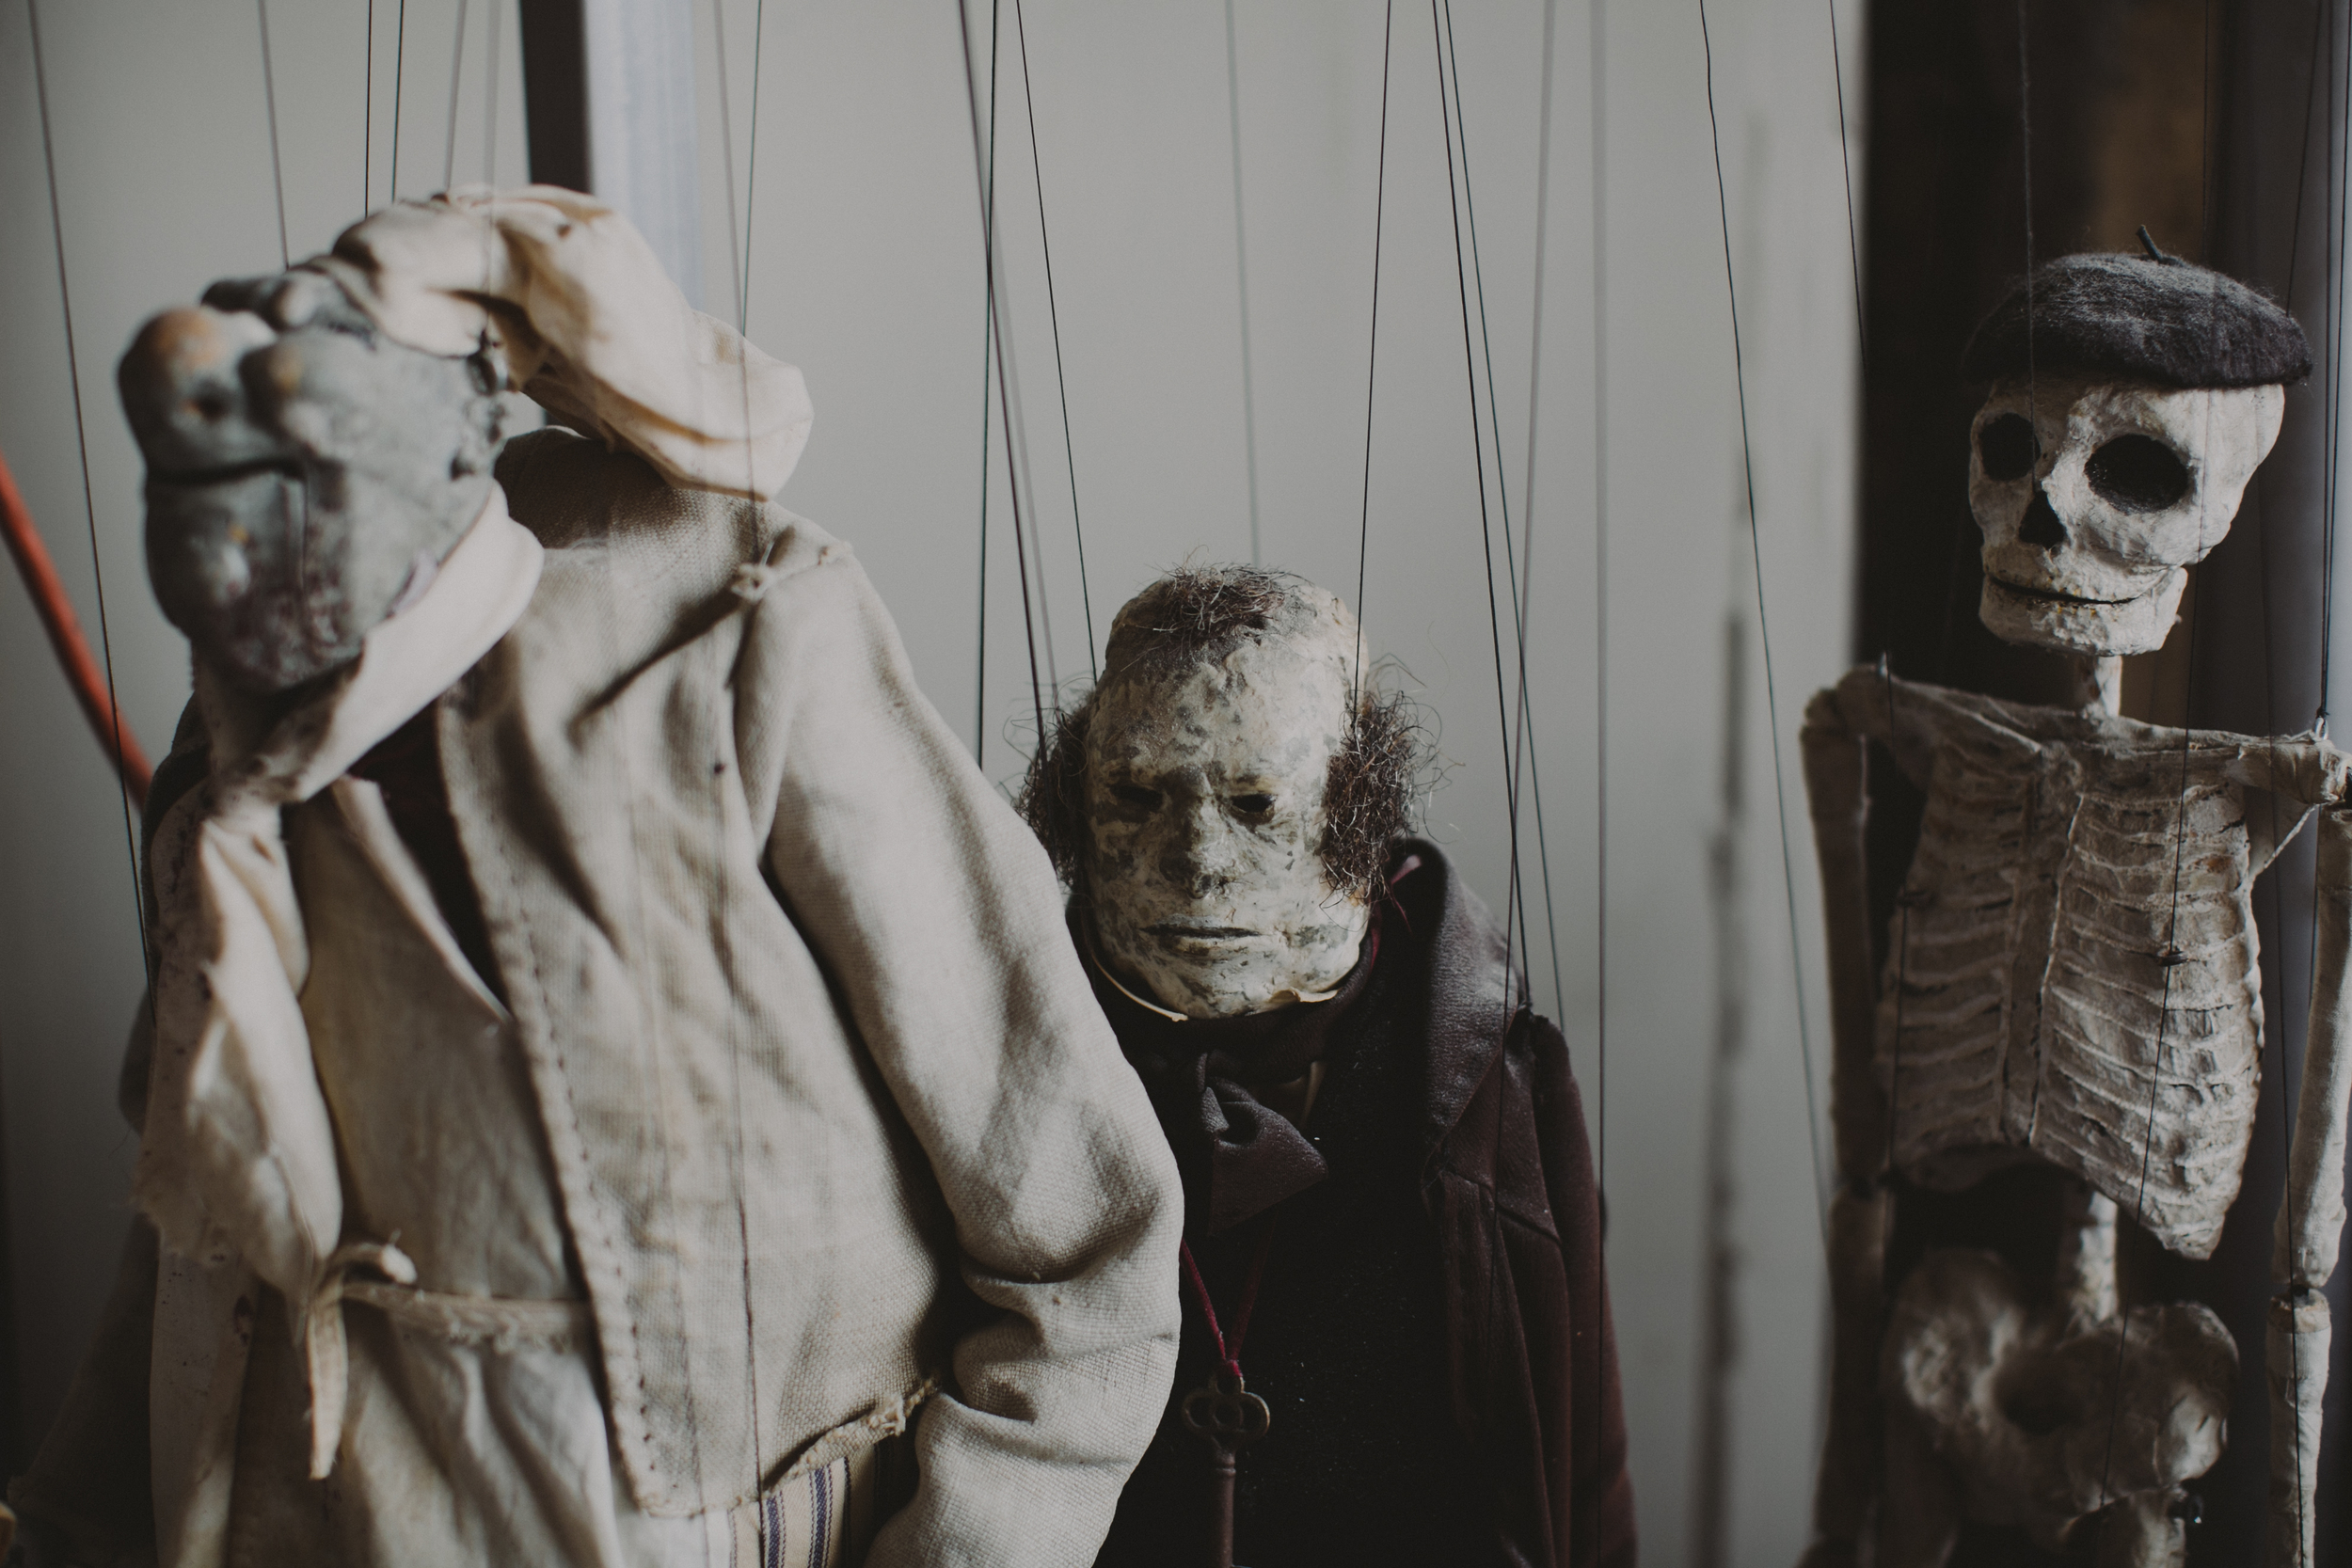 bogart portraits meet the michaels phantom limb 1916.JPG